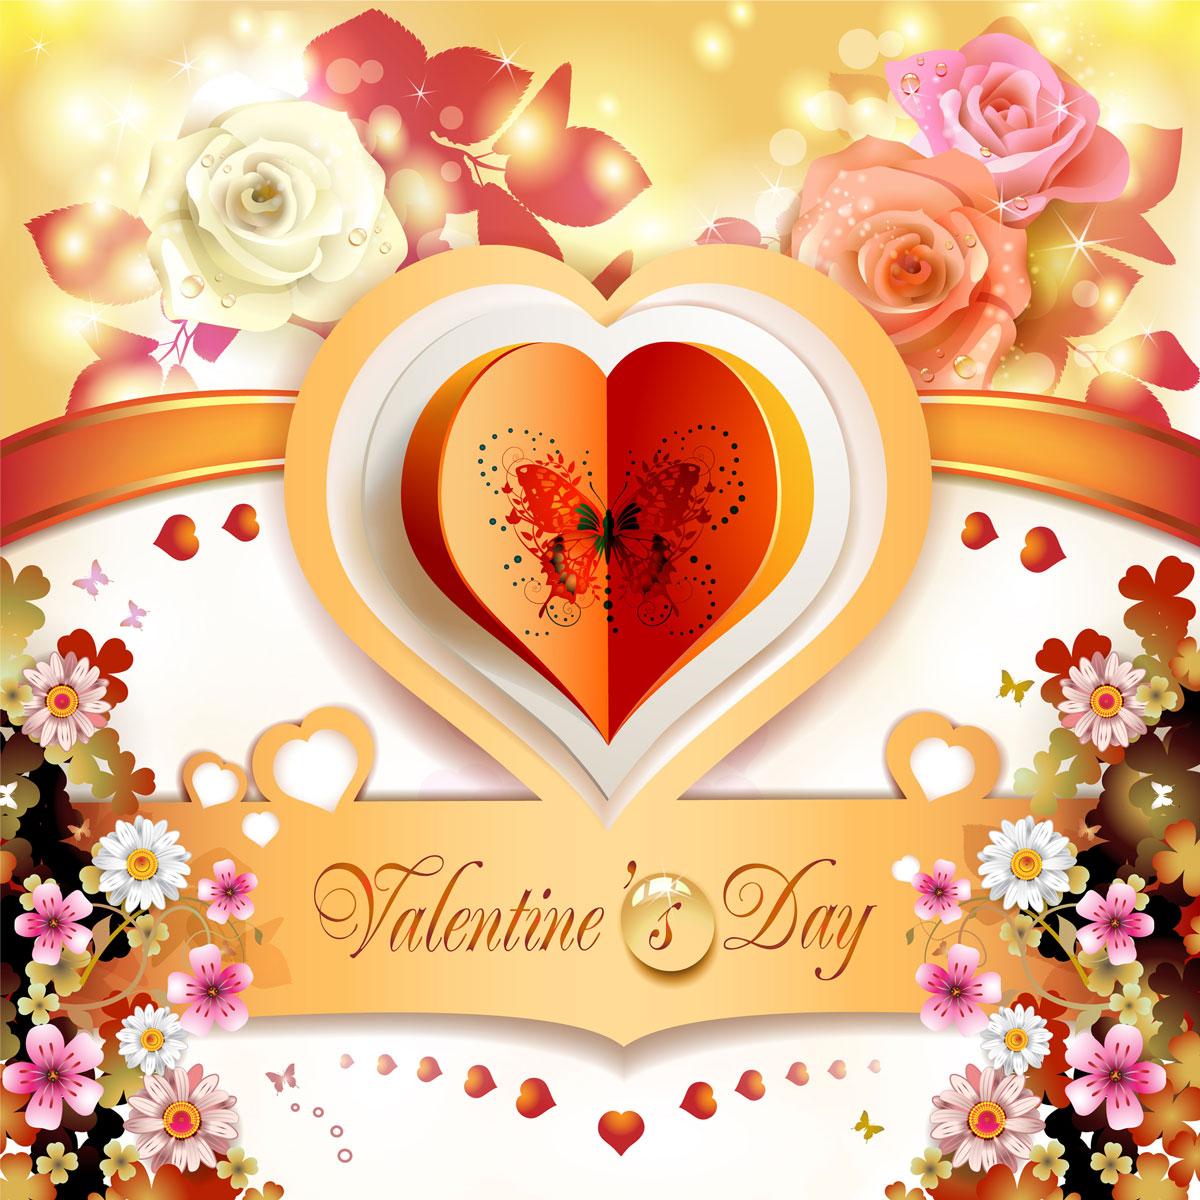 13款情人节七夕节爱心心形宣传海报设计AI矢量素材 Valentines Day Heart-shaped Vector Poster插图5